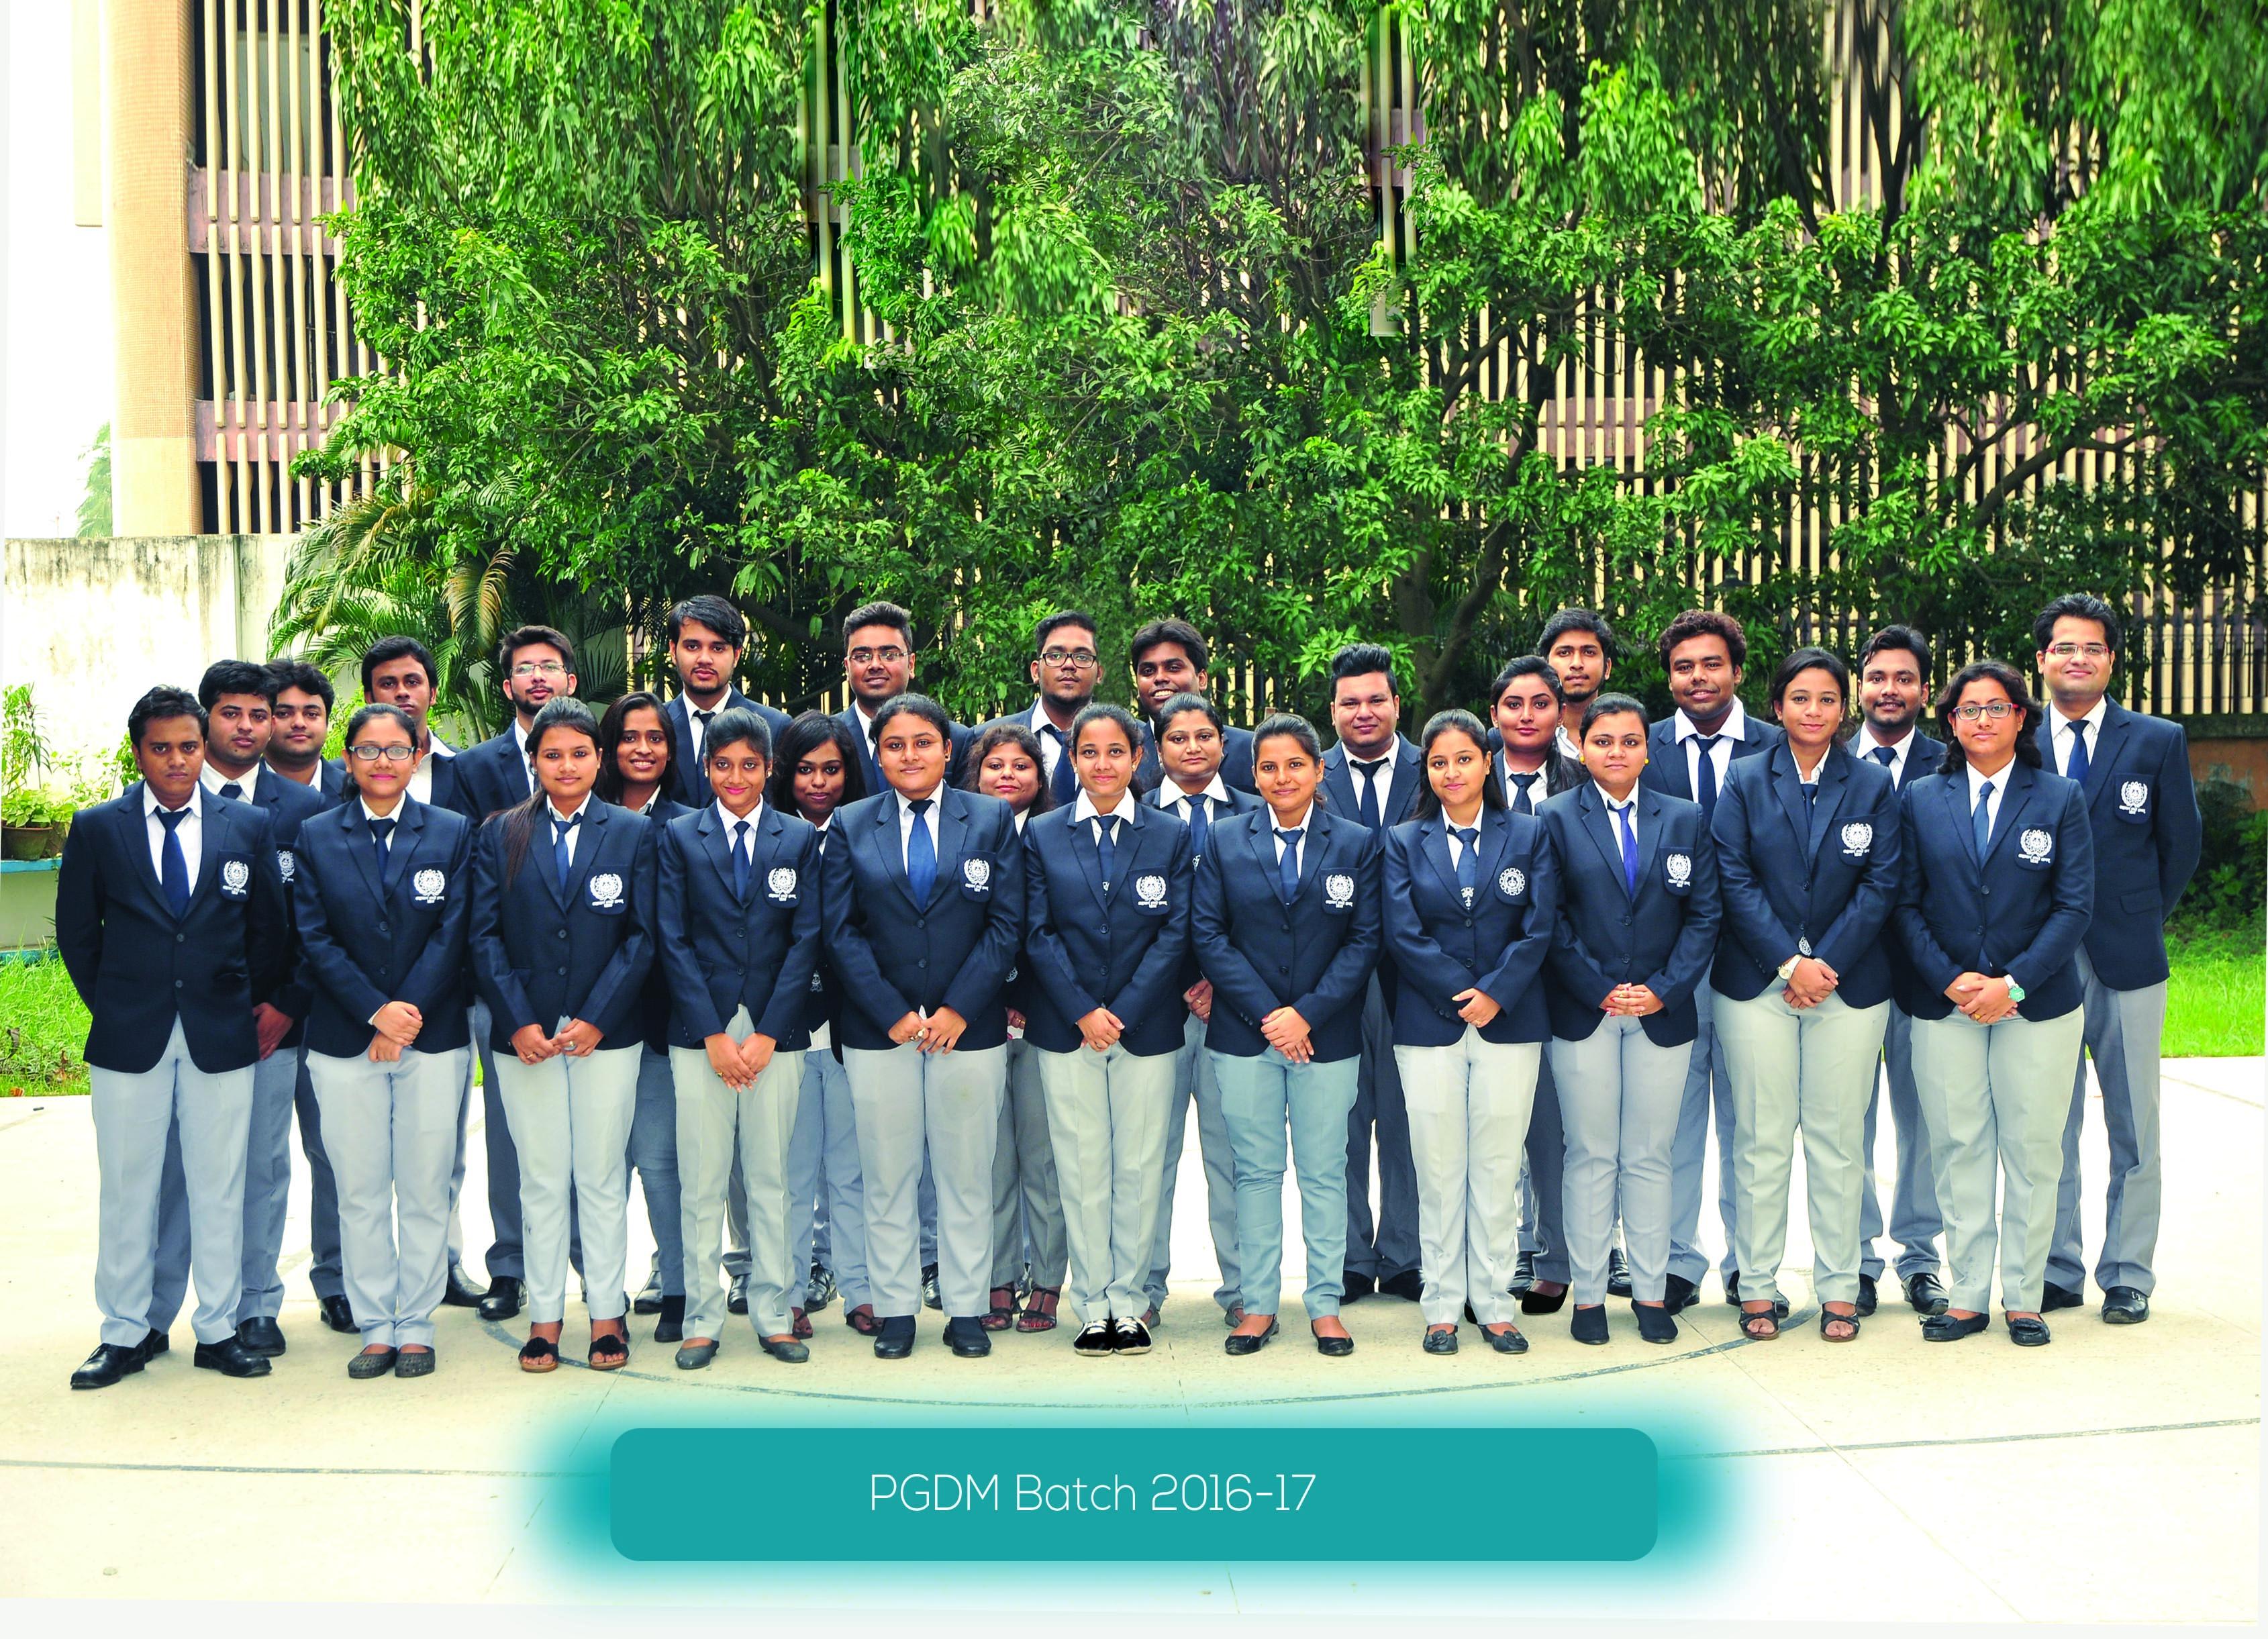 pgdm-group-photo